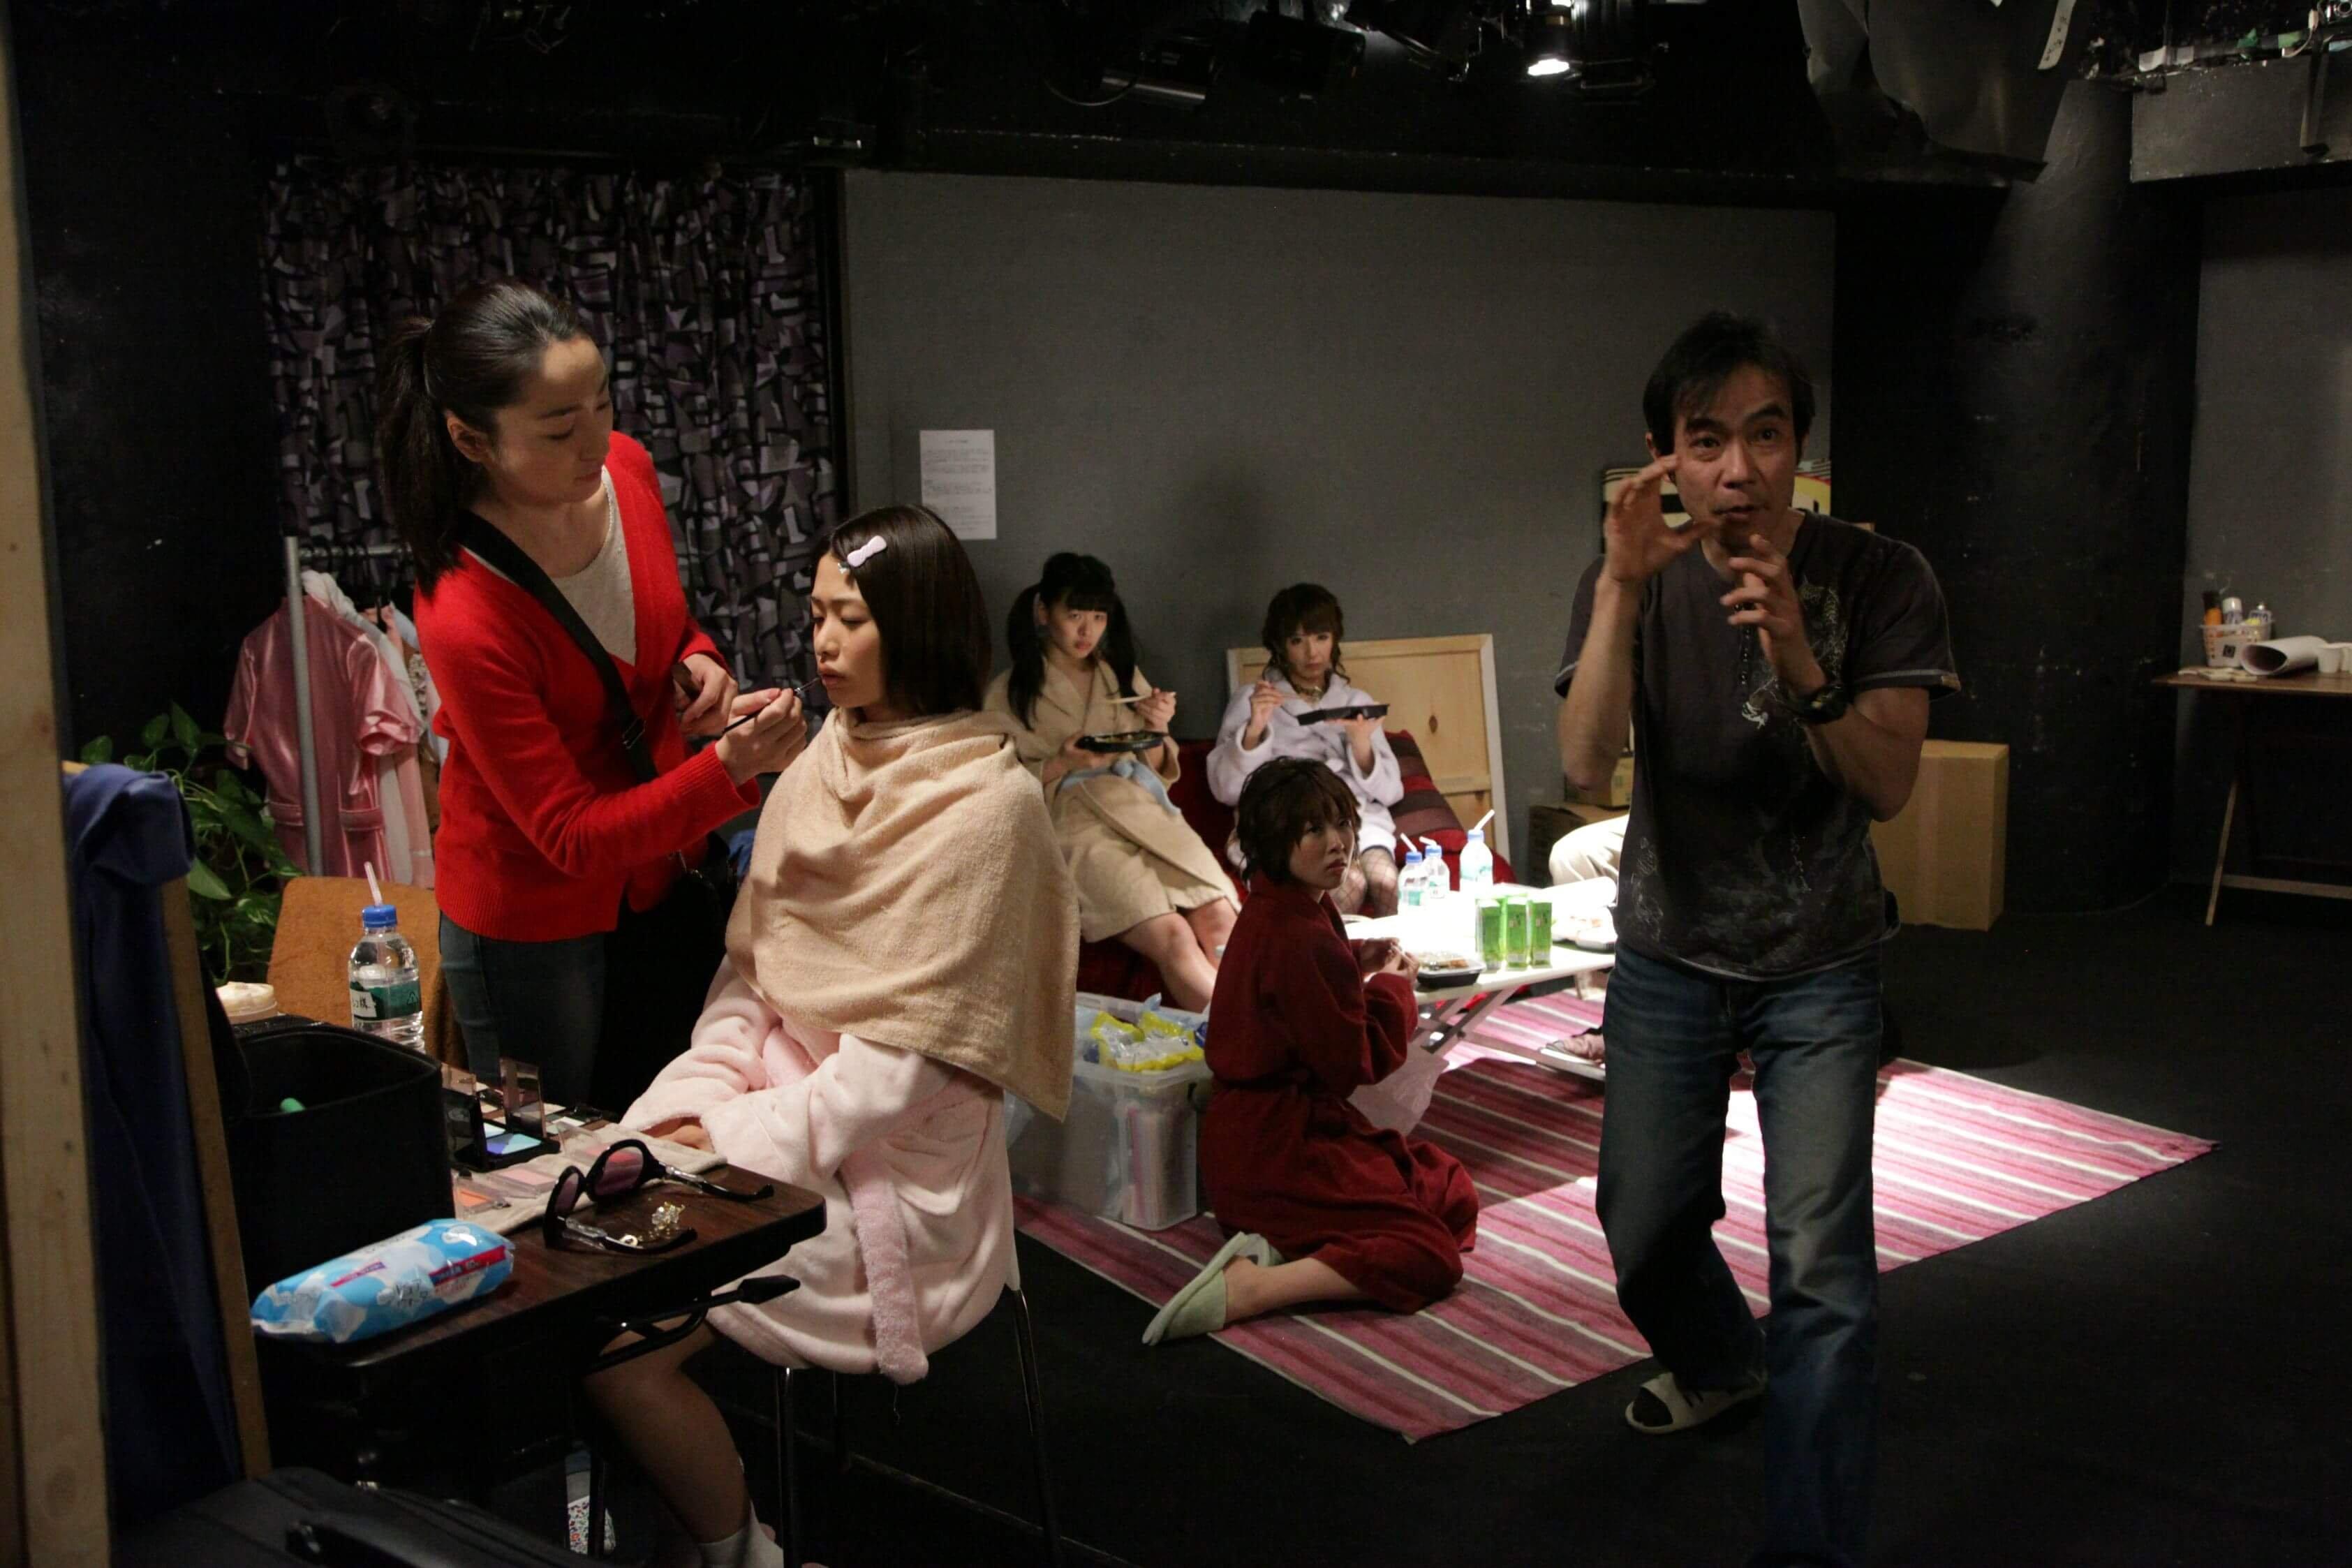 Av japan movie - nikees.info